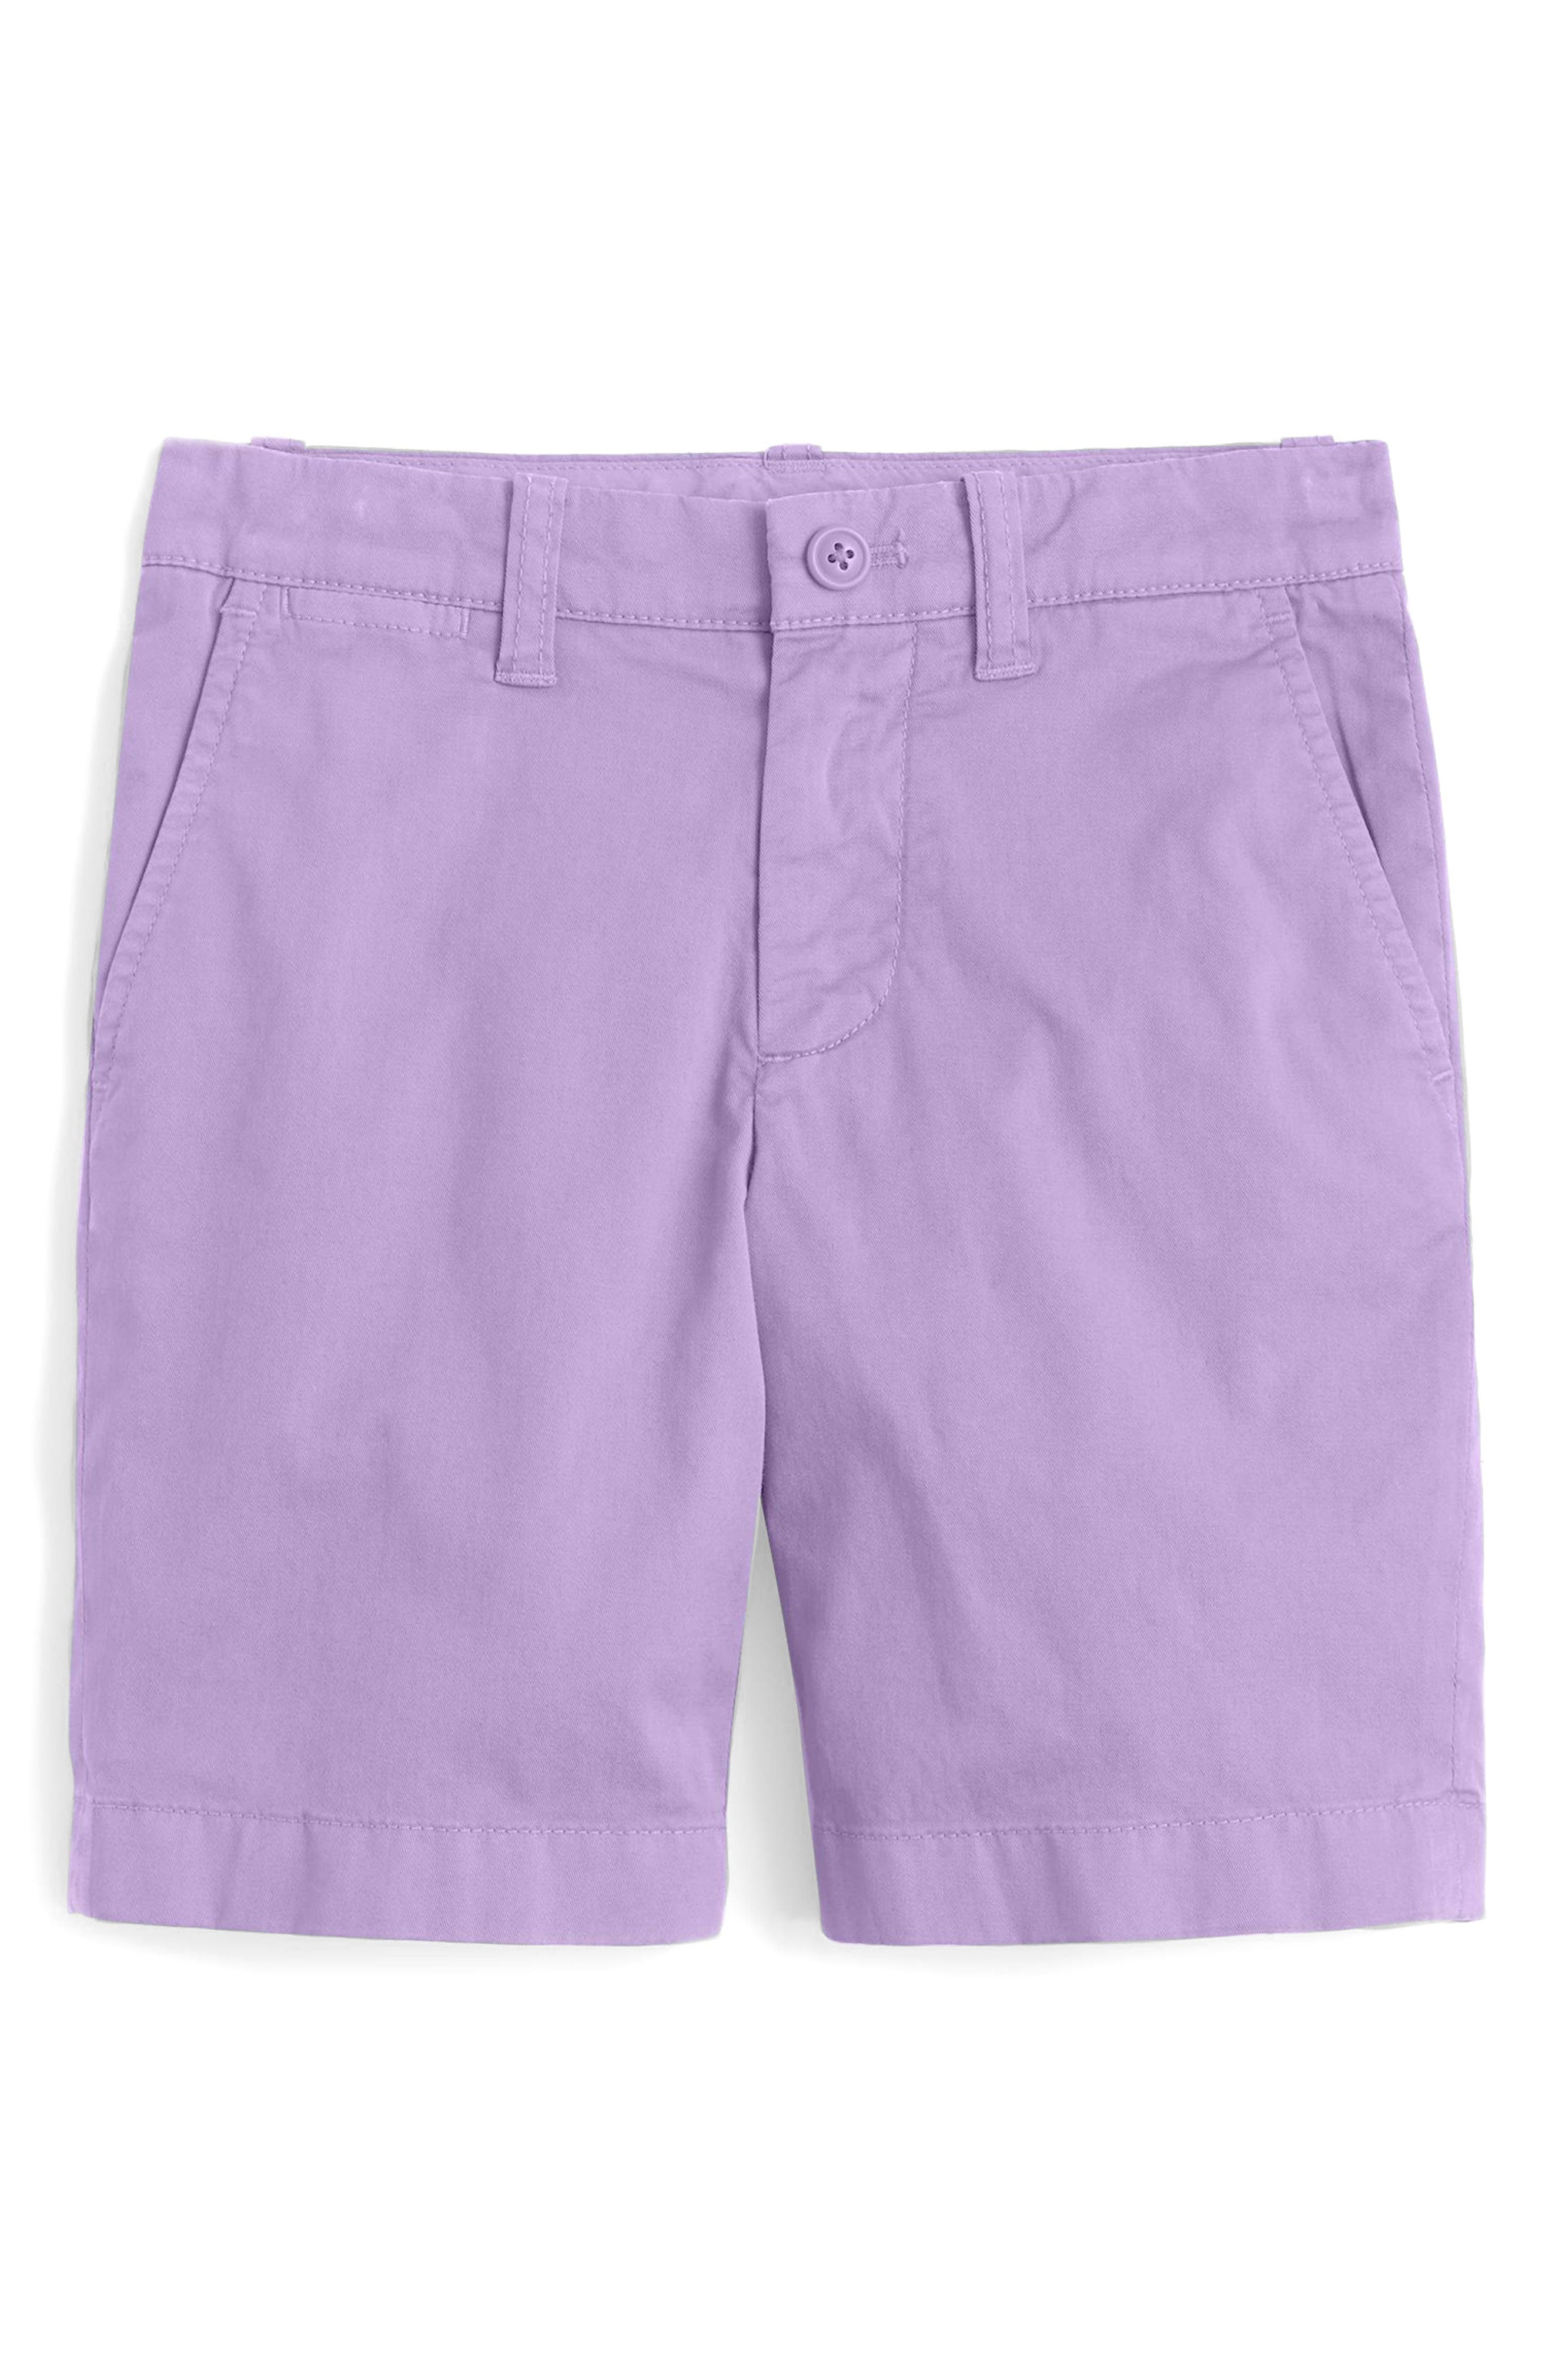 crewcuts by J.Crew Stanton Chino Shorts (Toddler Boys, Little Boys & Big Boys)